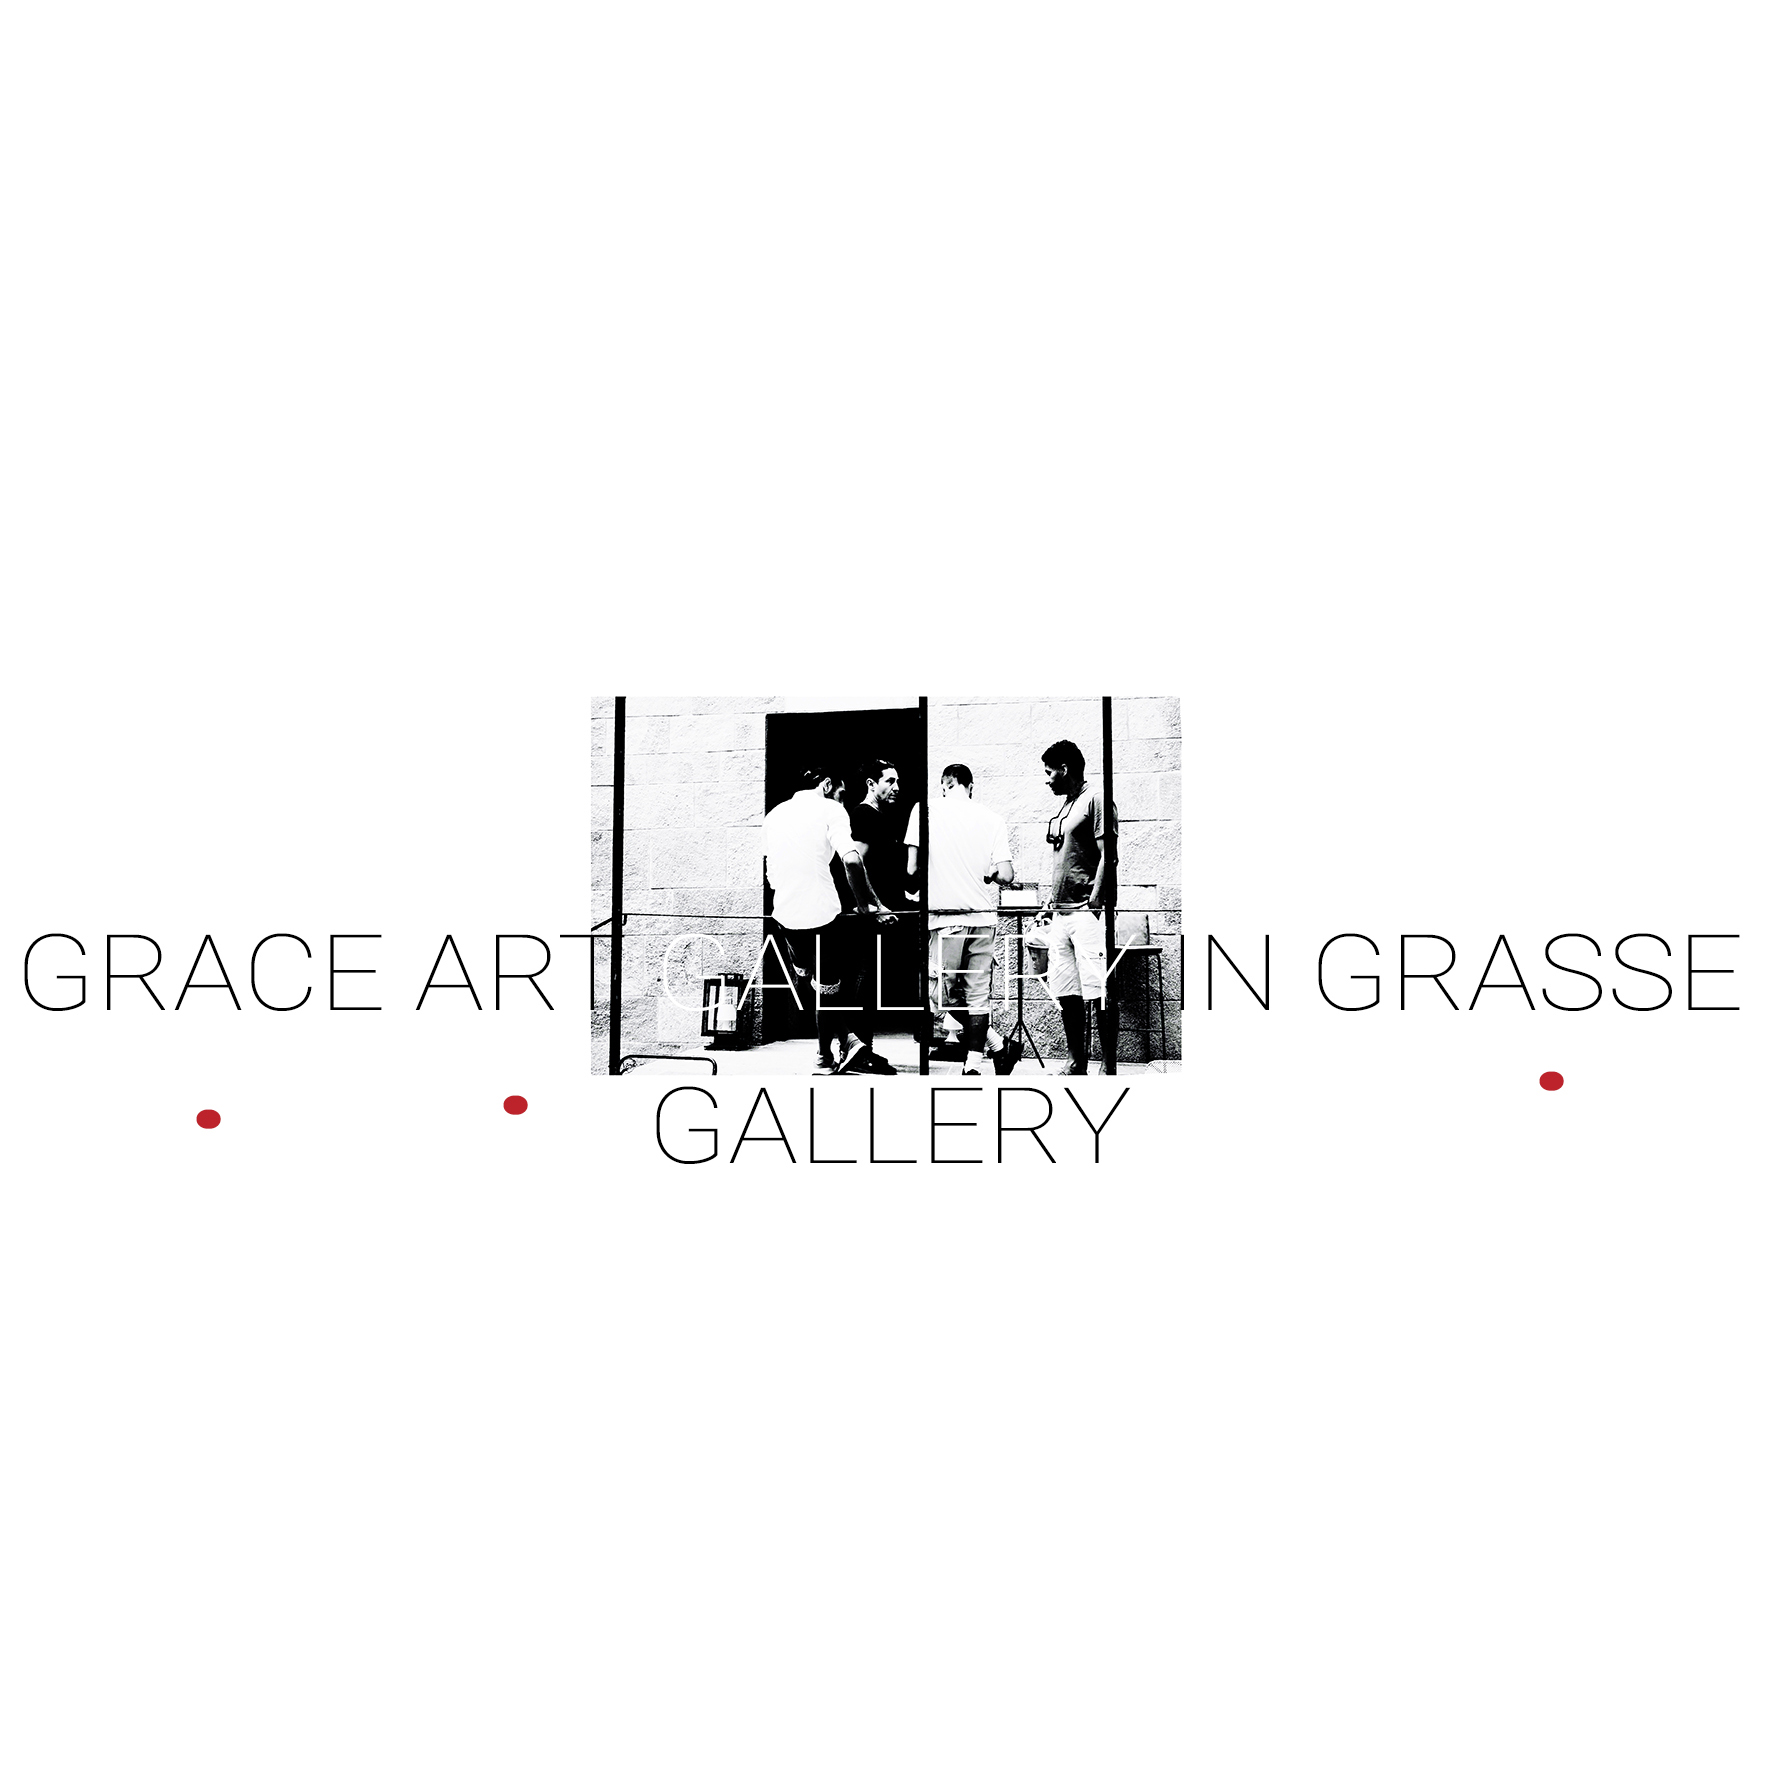 Grace Art gallery in Grasse by Olivier Durbano